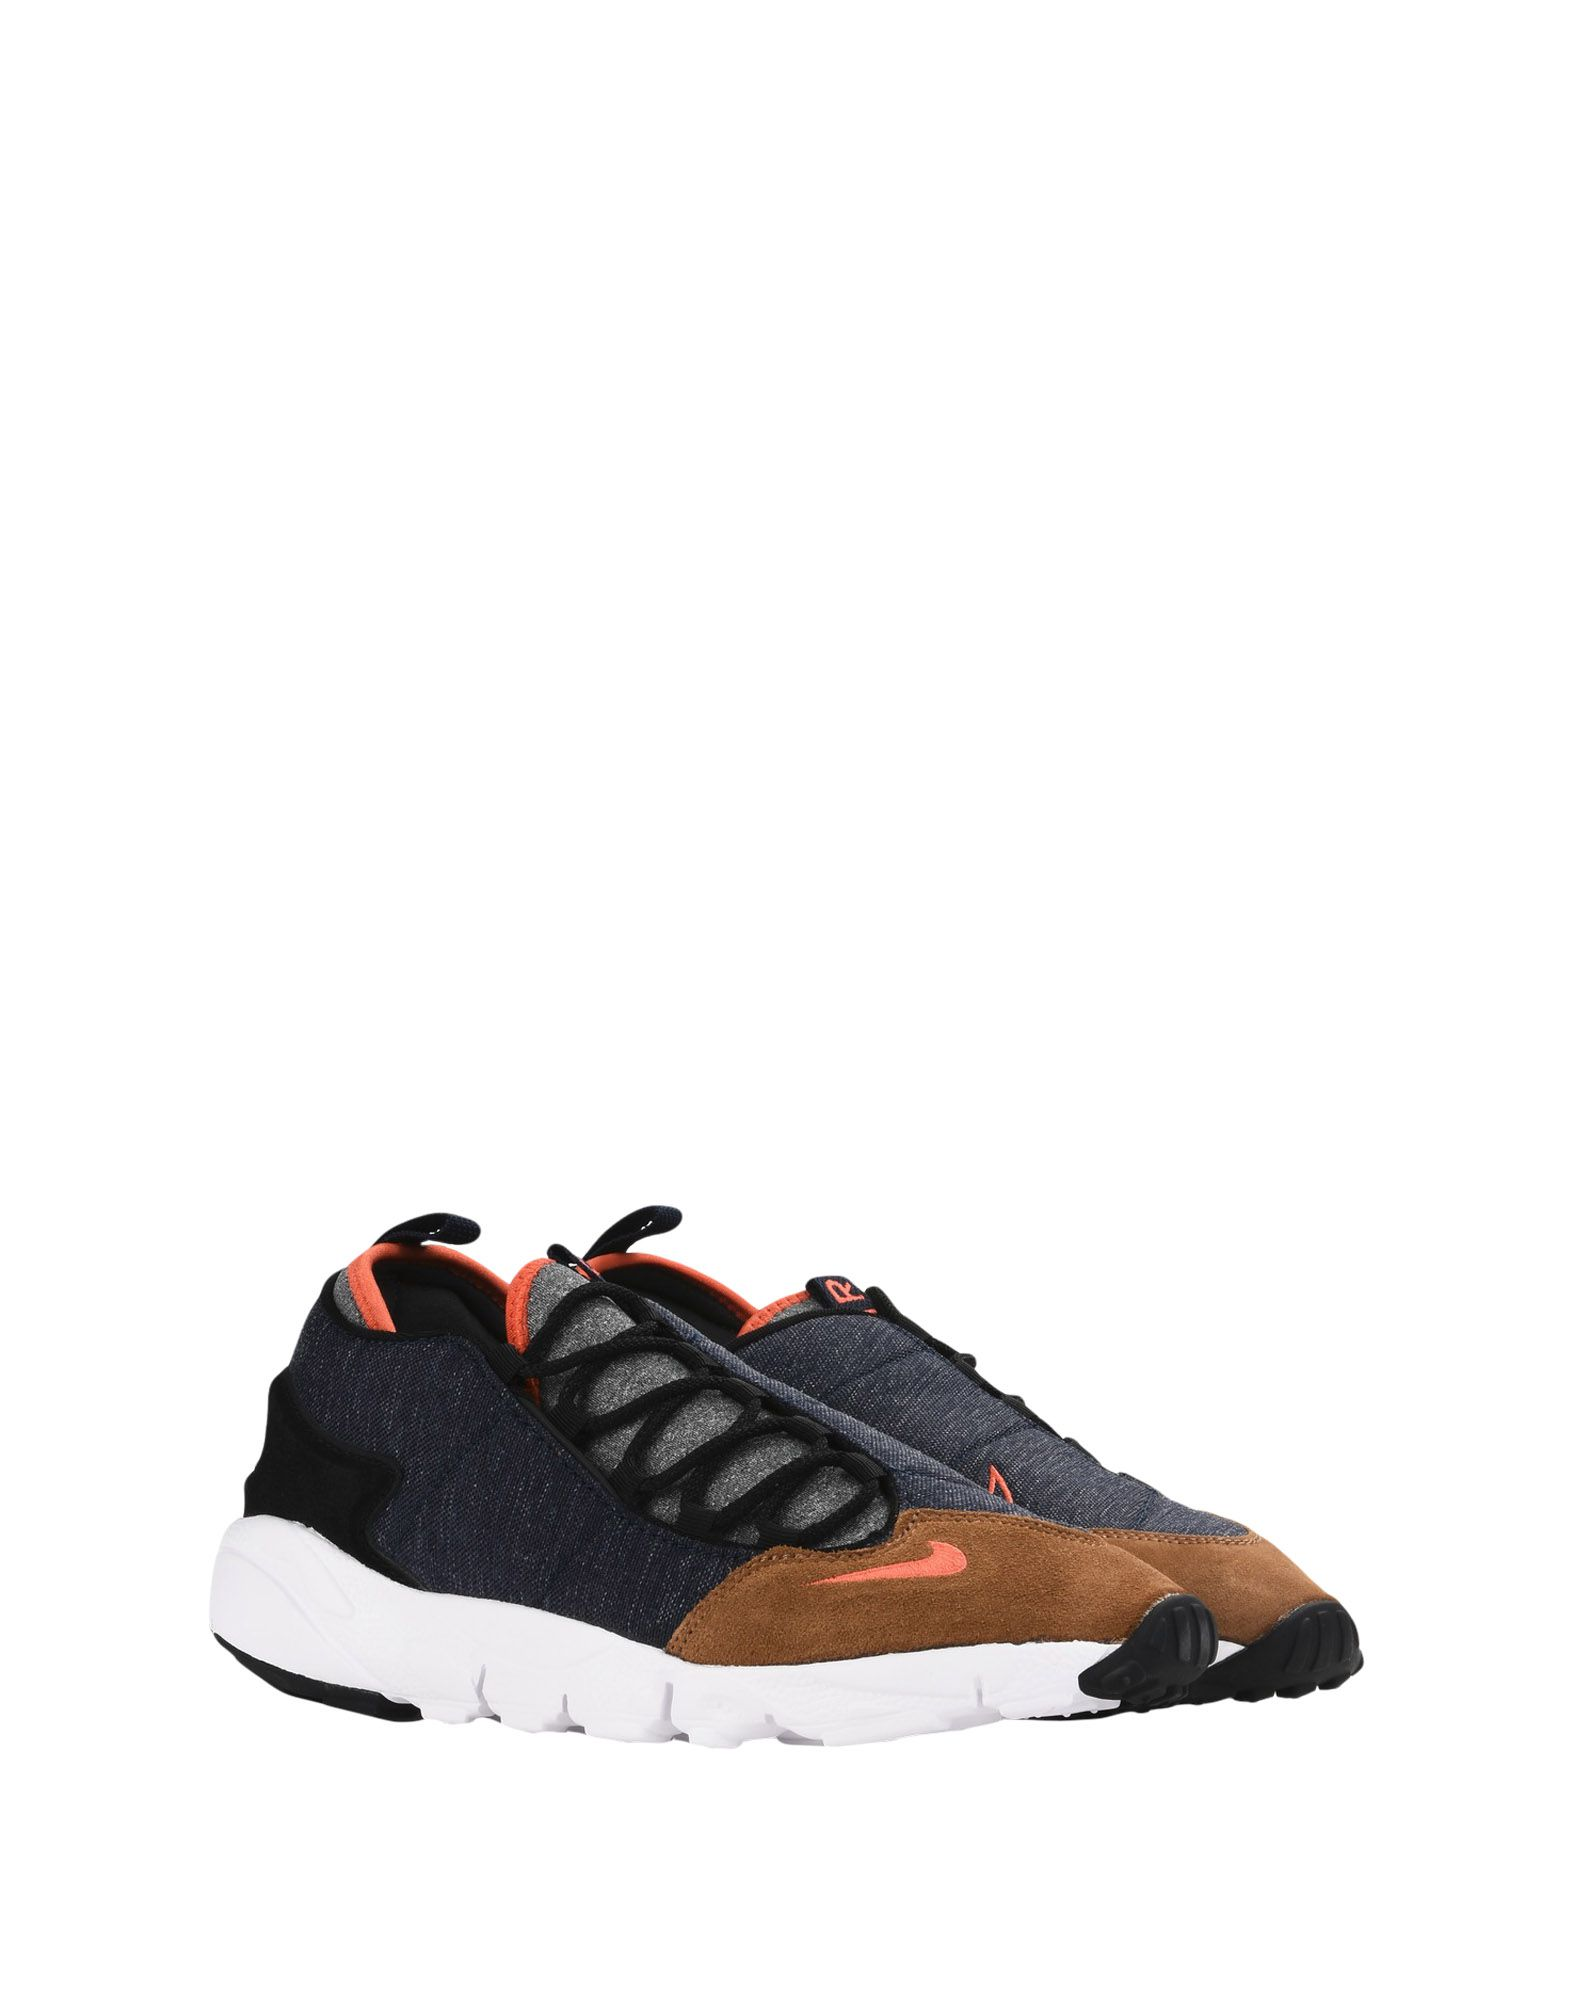 Nike Air Footscape beliebte Nm 11355235SM Gute Qualität beliebte Footscape Schuhe a69ae9